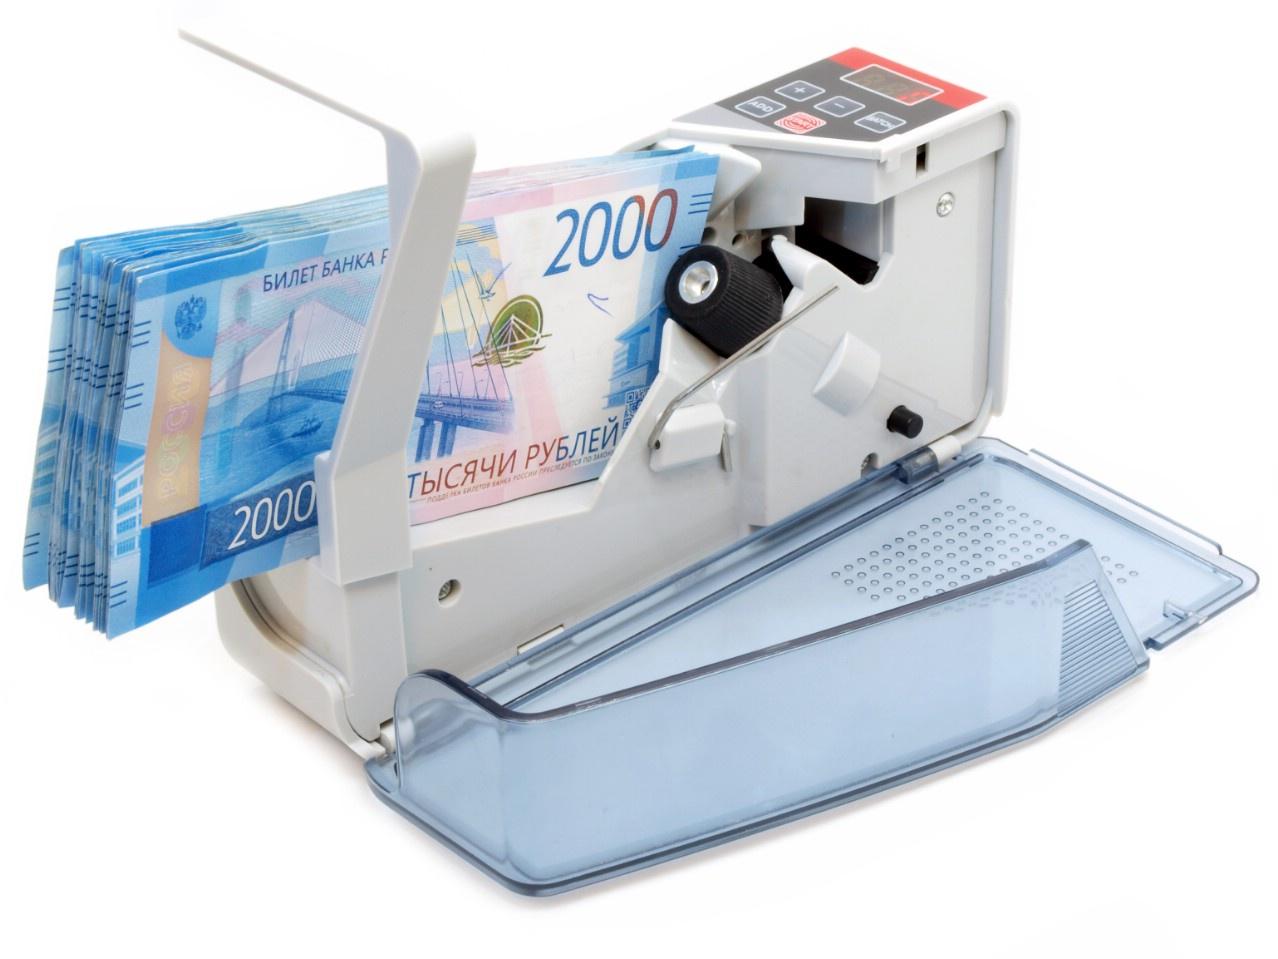 Портативный счетчик банкнот Sititech BC1015